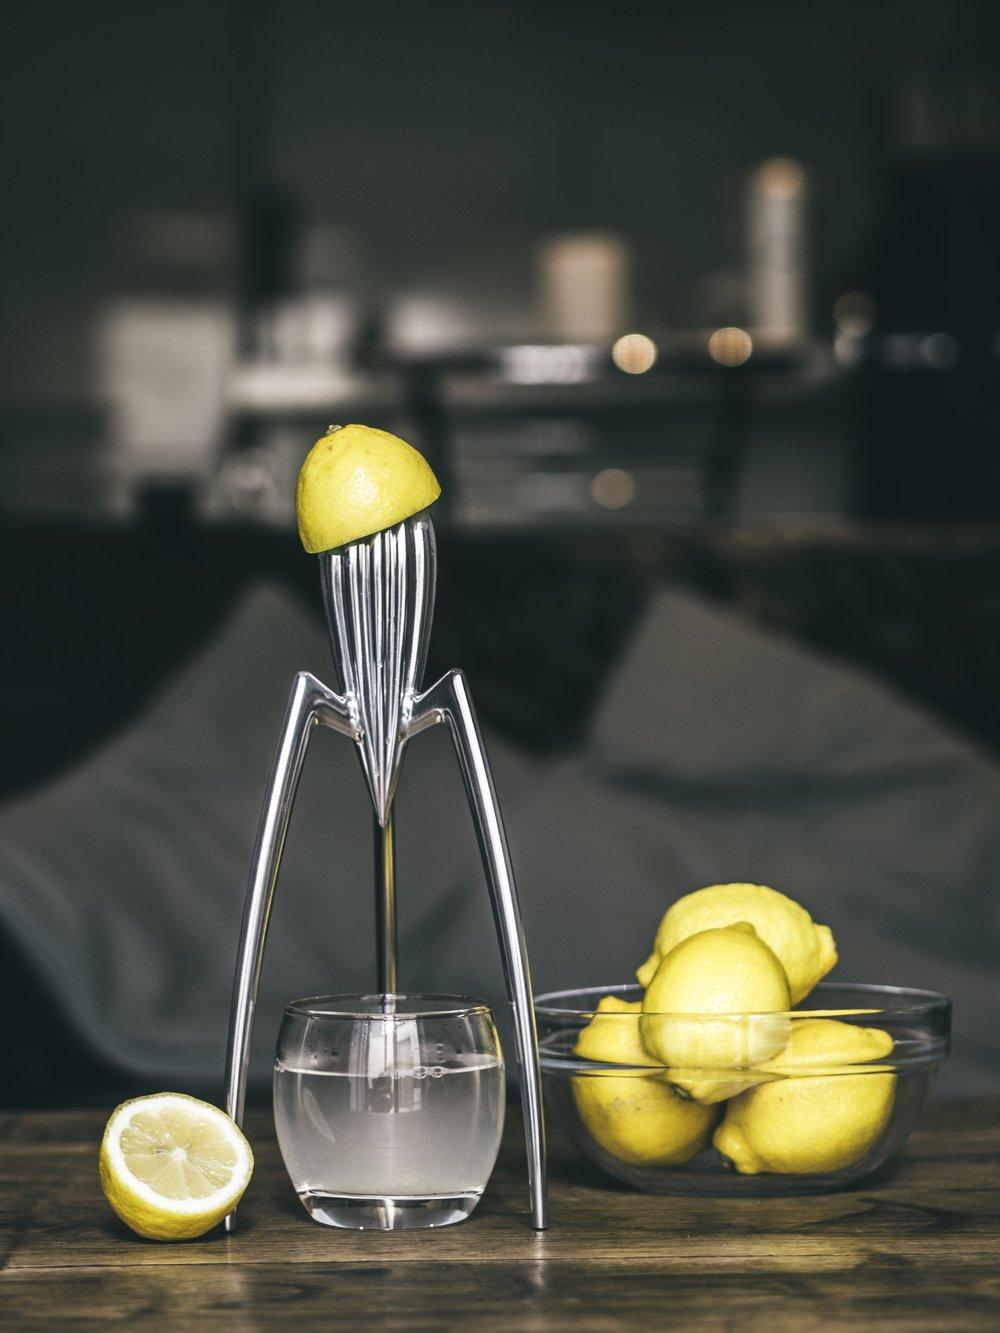 Alessi Juicy Salif by Philippe Stark 1990 Form vs Function Lemon Squeezer